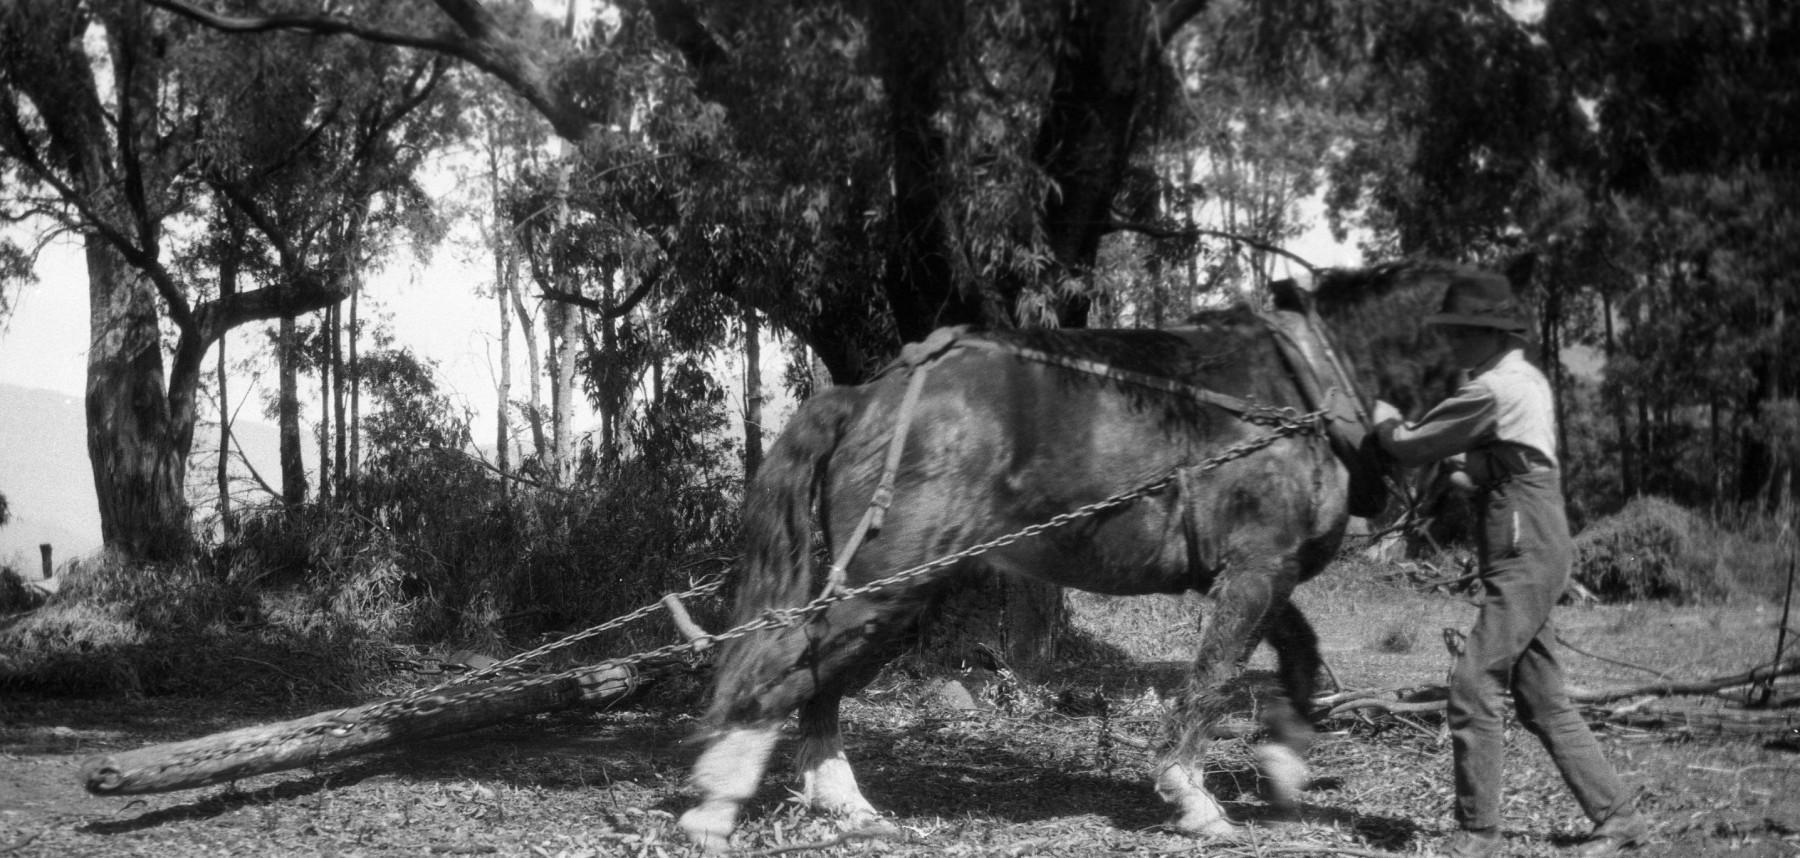 Walter-Ryder-Jnr-clearing-timber-from-farmland-at-Tawonga-c.-1926